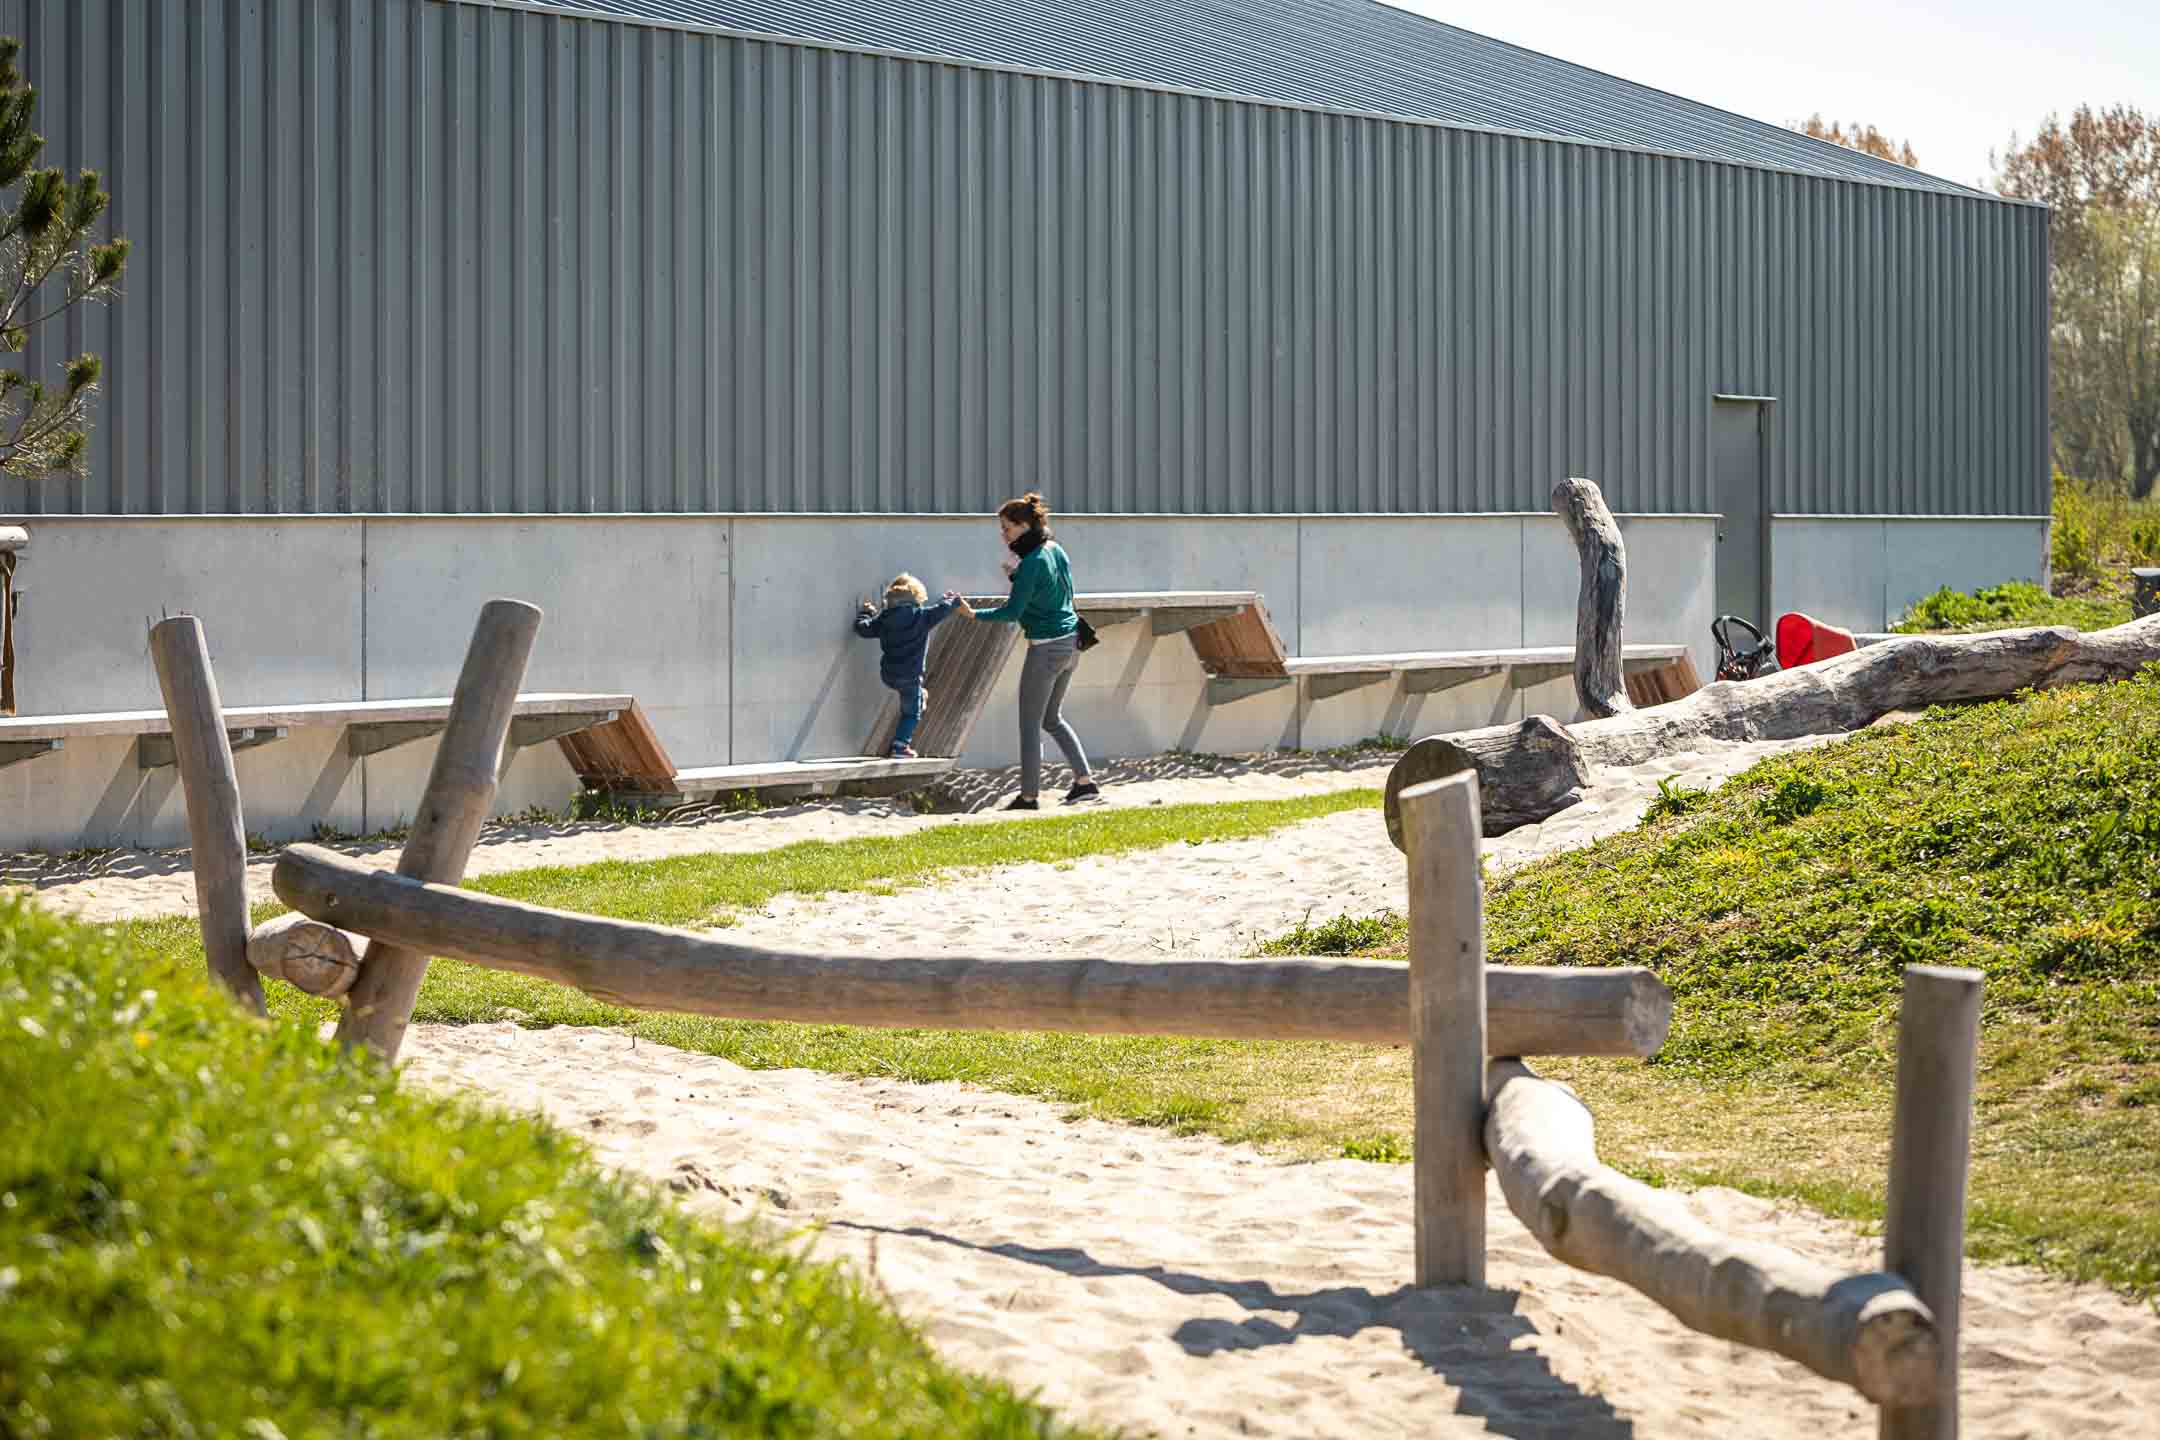 park ontwerp rieteiland amsterdam landschap